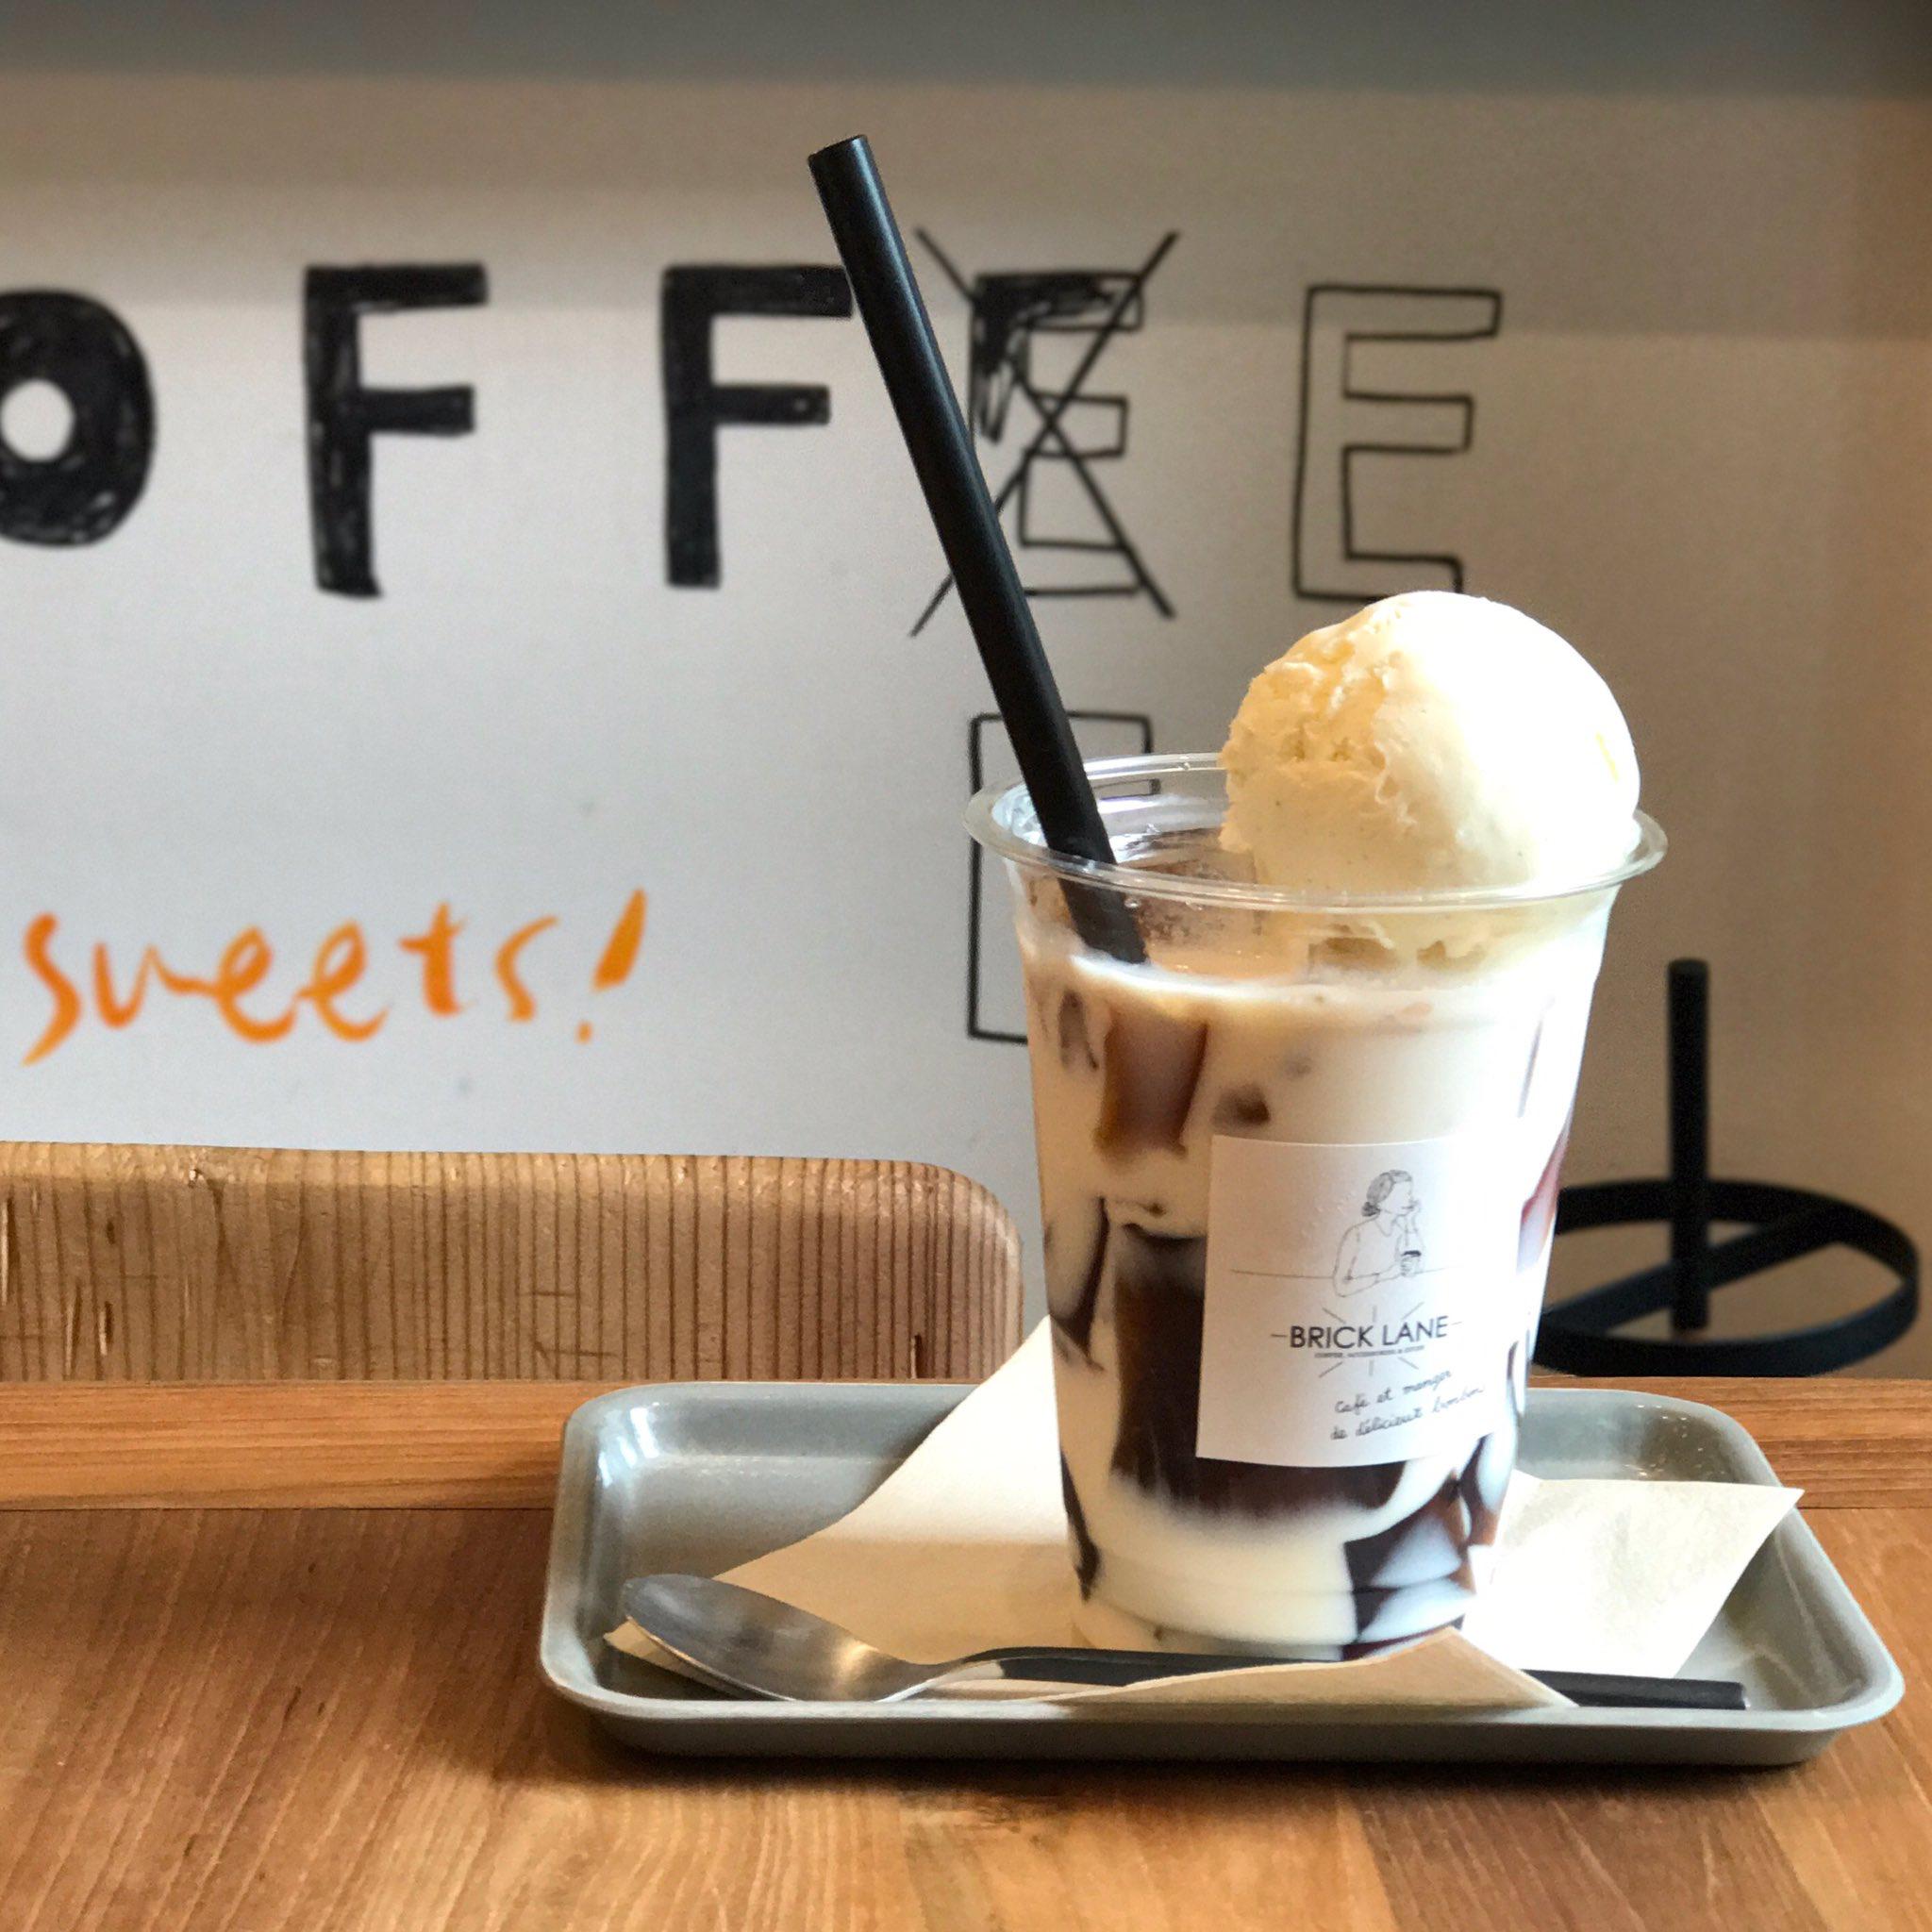 「Grass jelly」おしゃれまとめの人気アイデア|Pinterest|Sarayut Malai カフェ, 飲み物